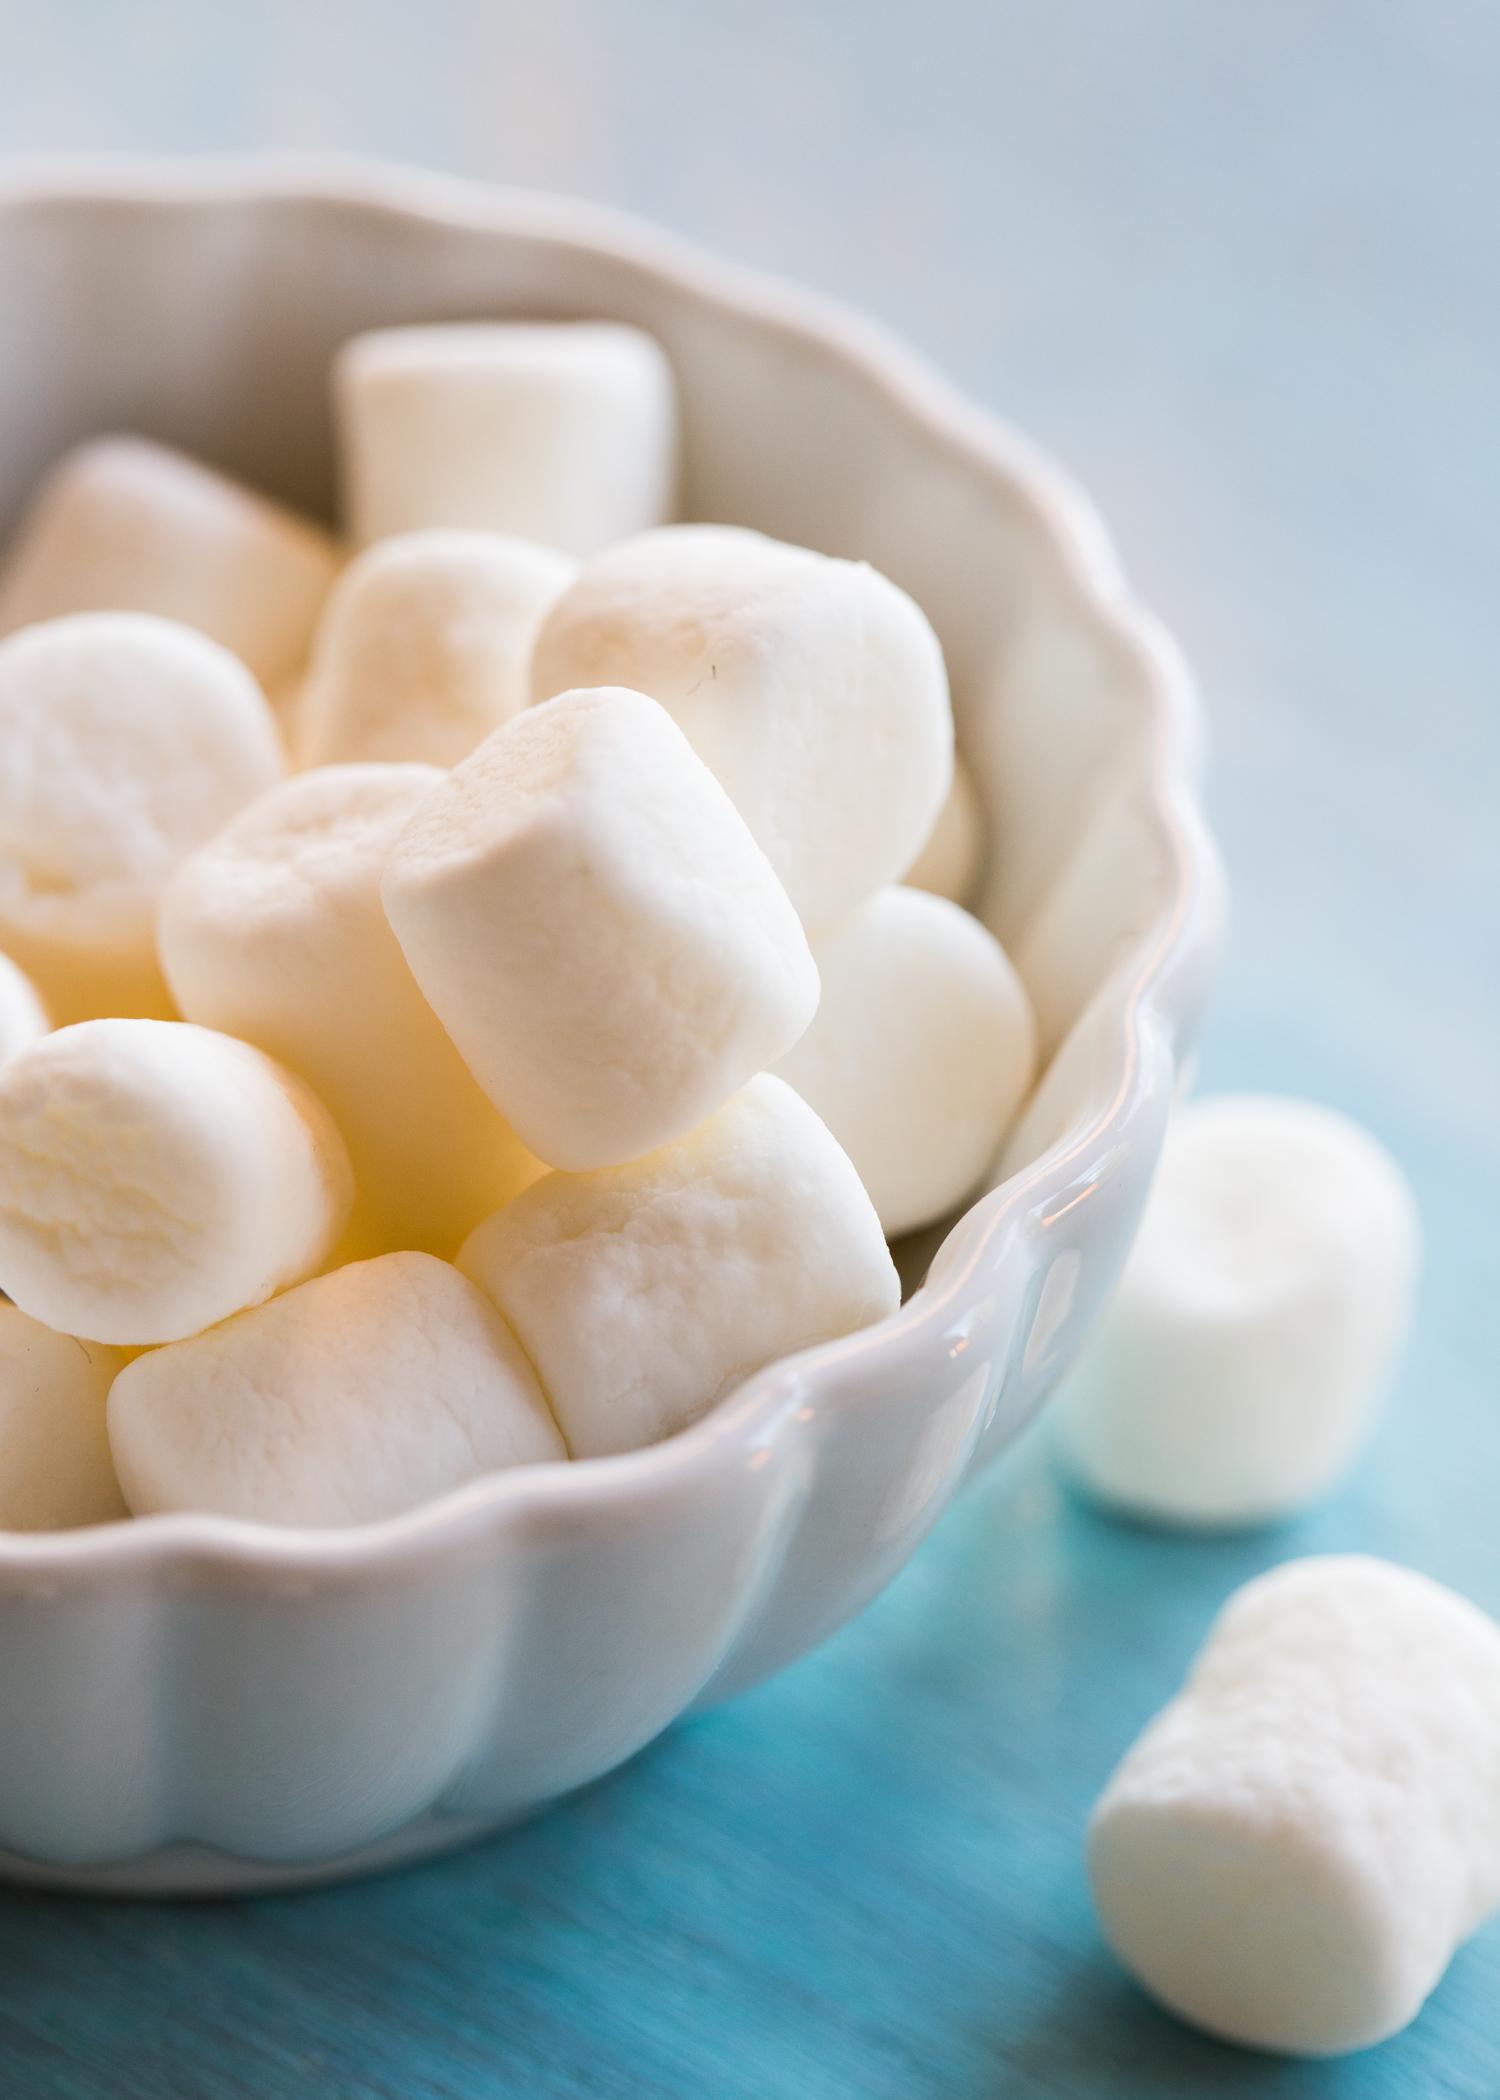 Marshmallow Treat Milkshake | JellyToastBlog.com